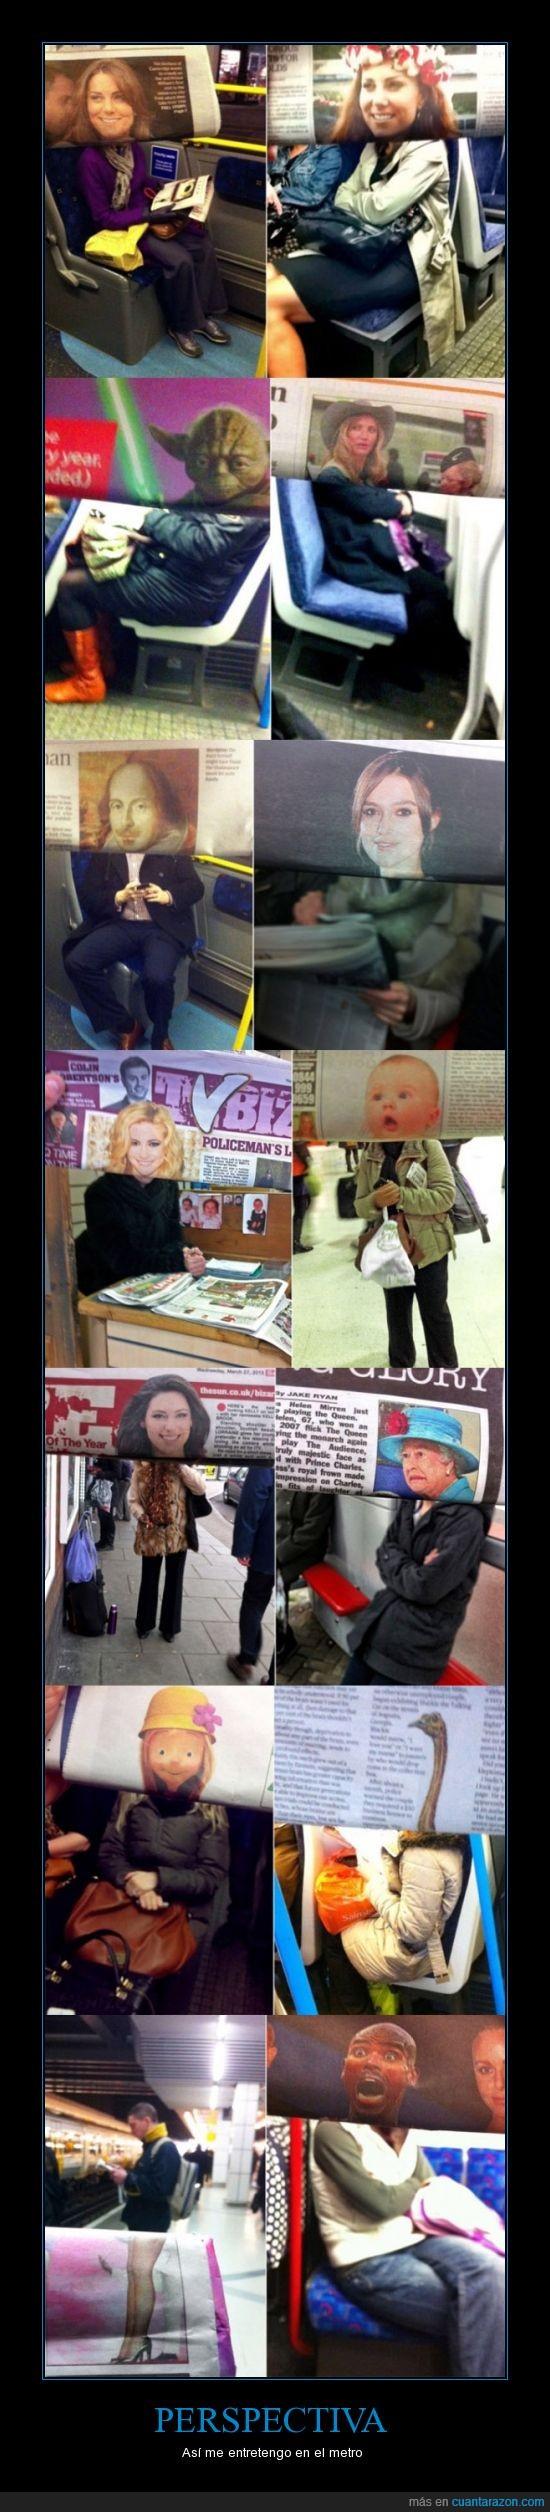 caras,cuerpos,diario,imagen,metro,periódico,perspectiva,tren